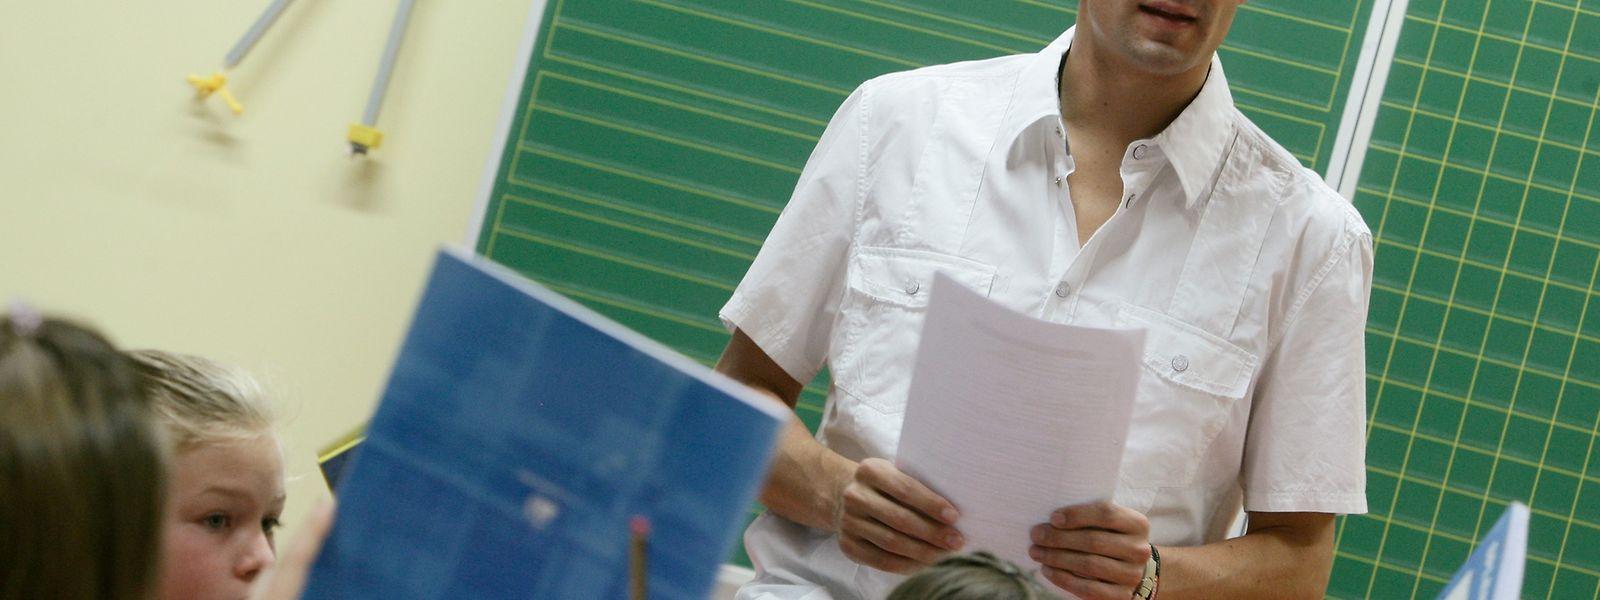 A OGBL queixa-se da falta de professores no ensino fundamental